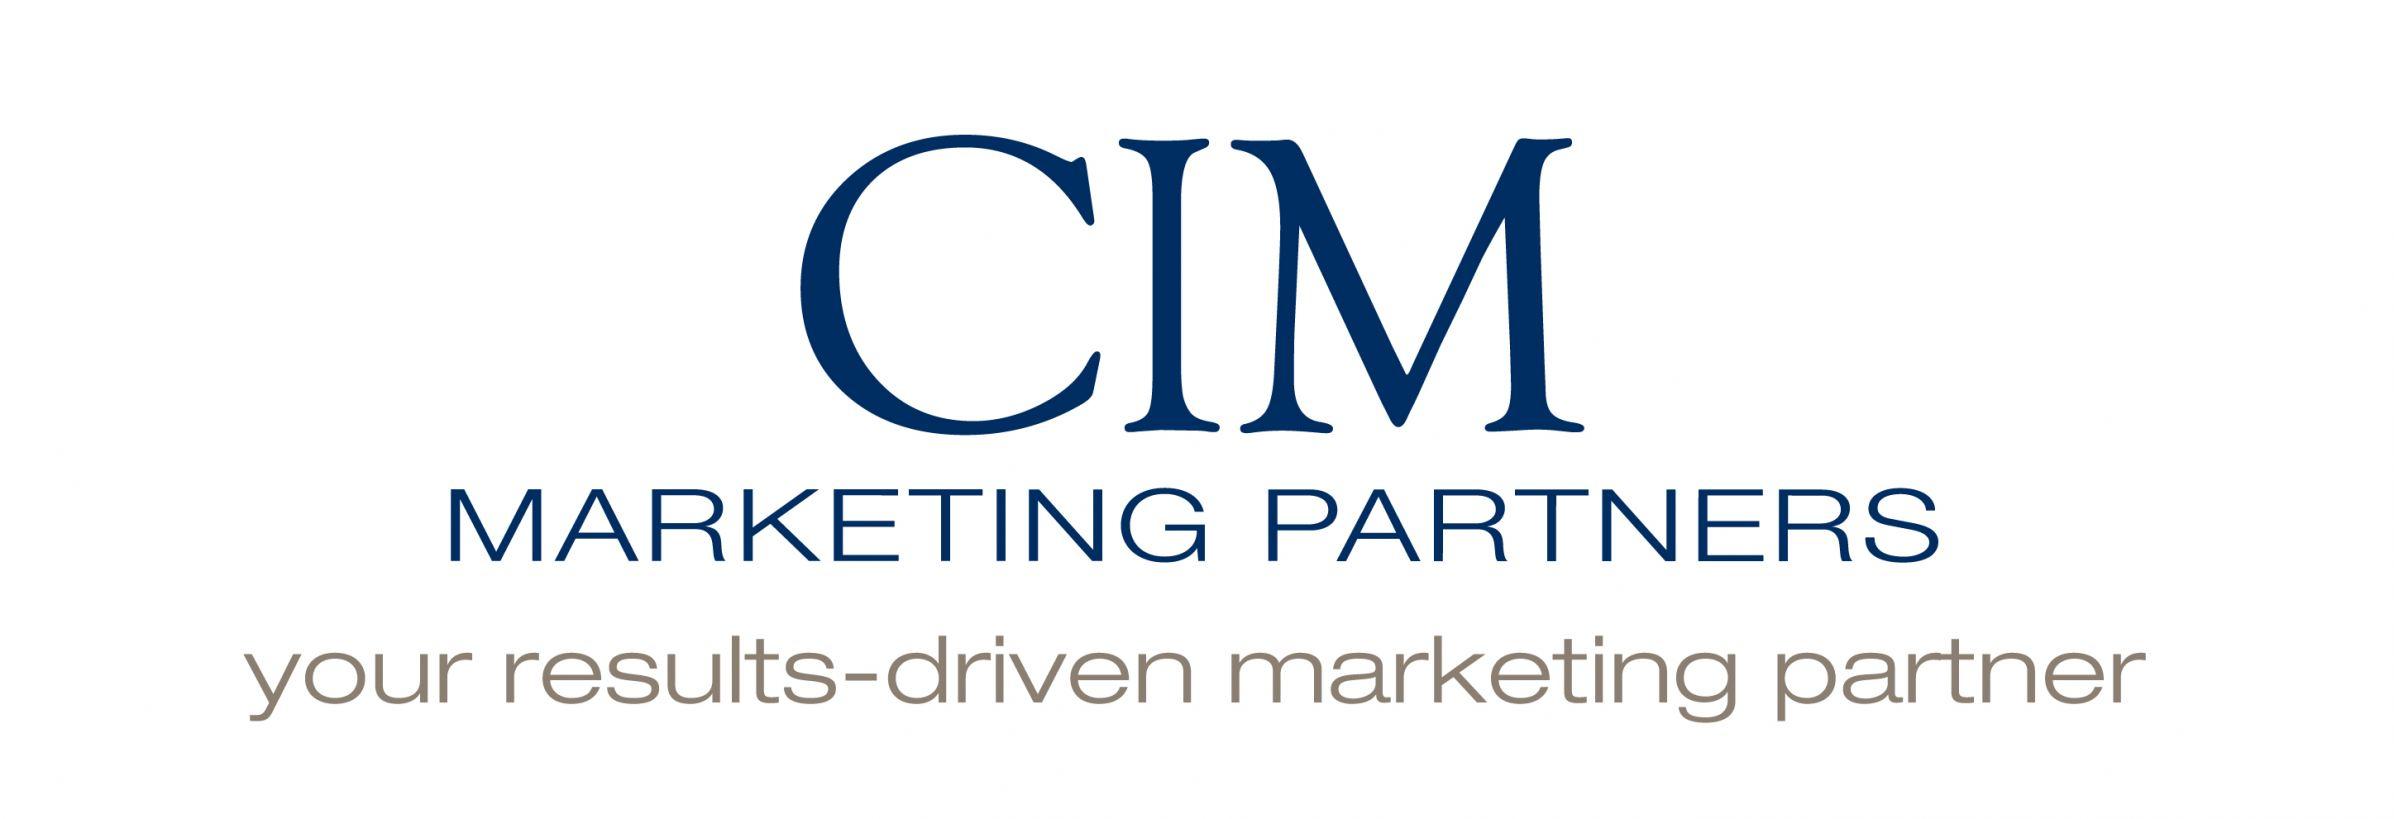 CIM Marketing Partners Logo